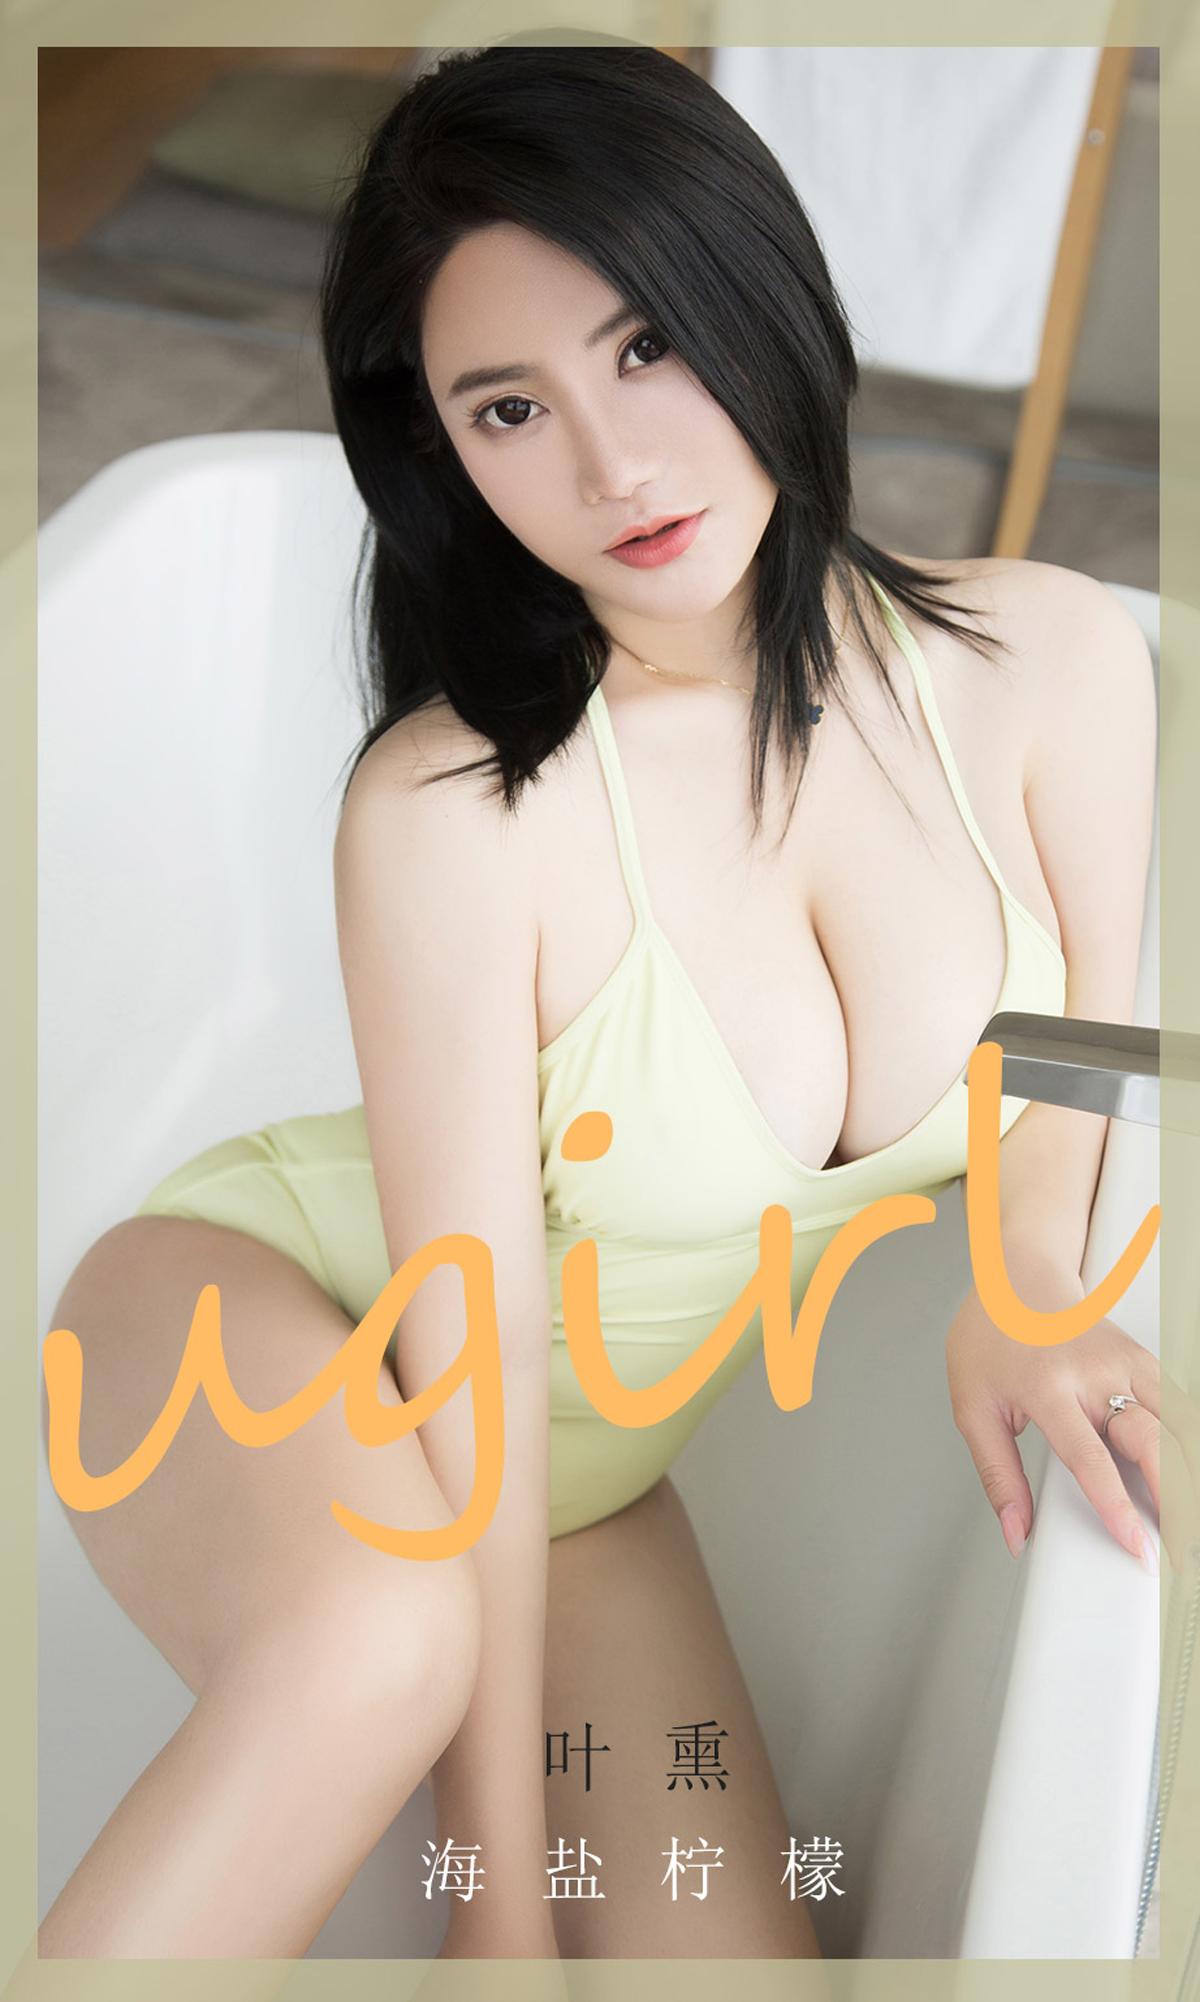 [Ugirls尤果网]爱尤物 2020.07.13 No.1865 叶熏 海盐柠檬[/28.2MB]